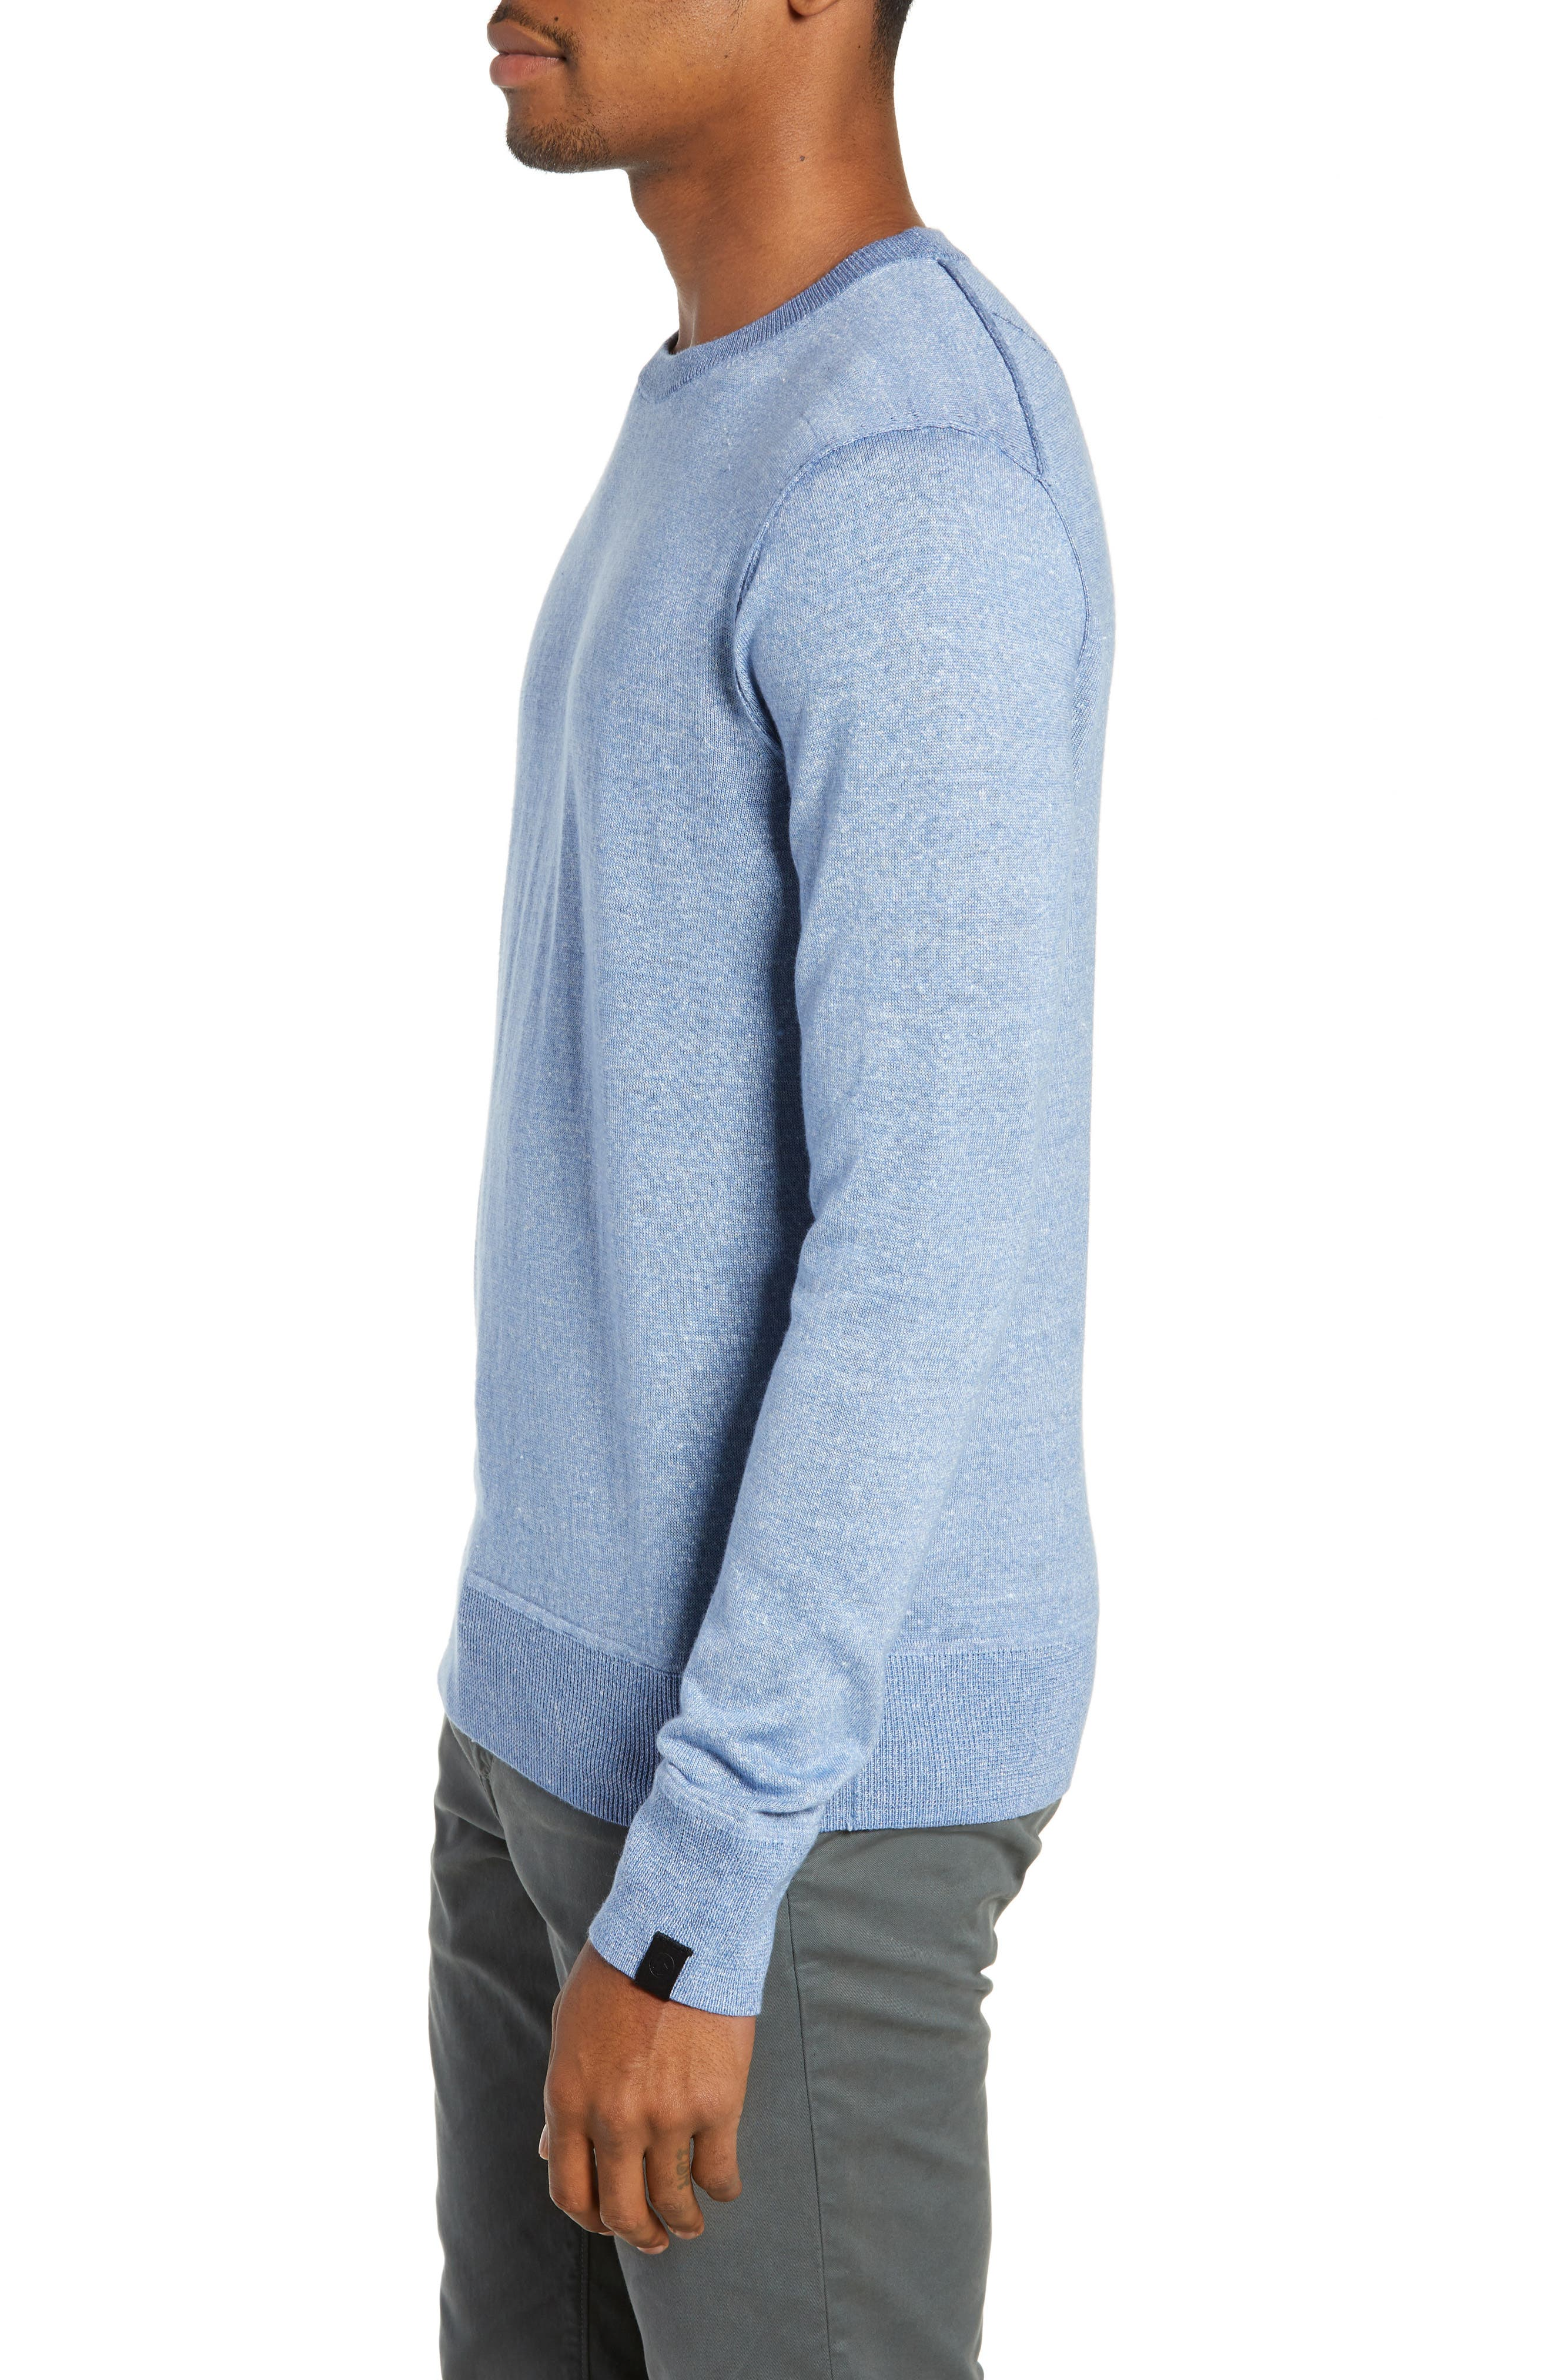 RAG & BONE, Dean Slim Fit Crewneck Sweater, Alternate thumbnail 3, color, 455